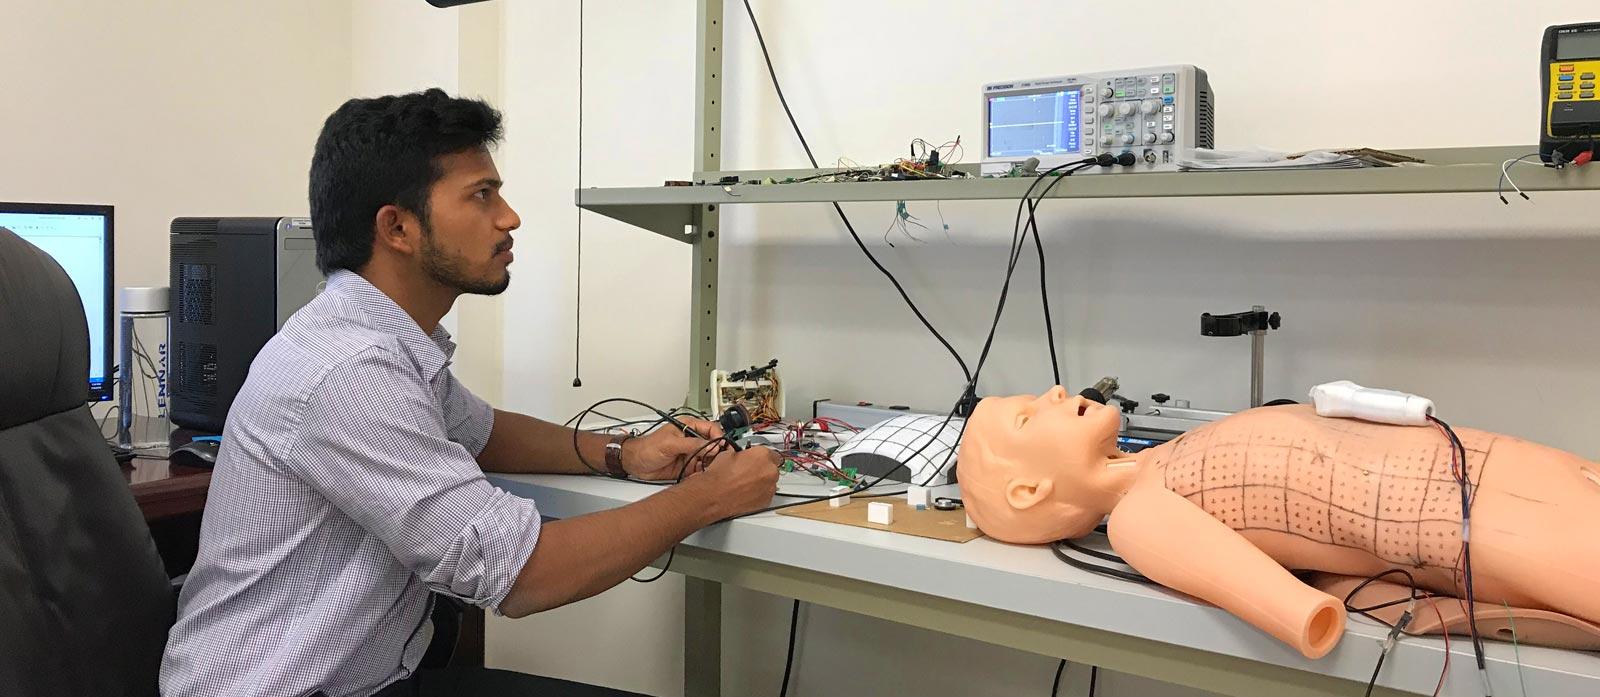 gaumard-scientific-aniket-jangam-fiu-college-engineering-computing